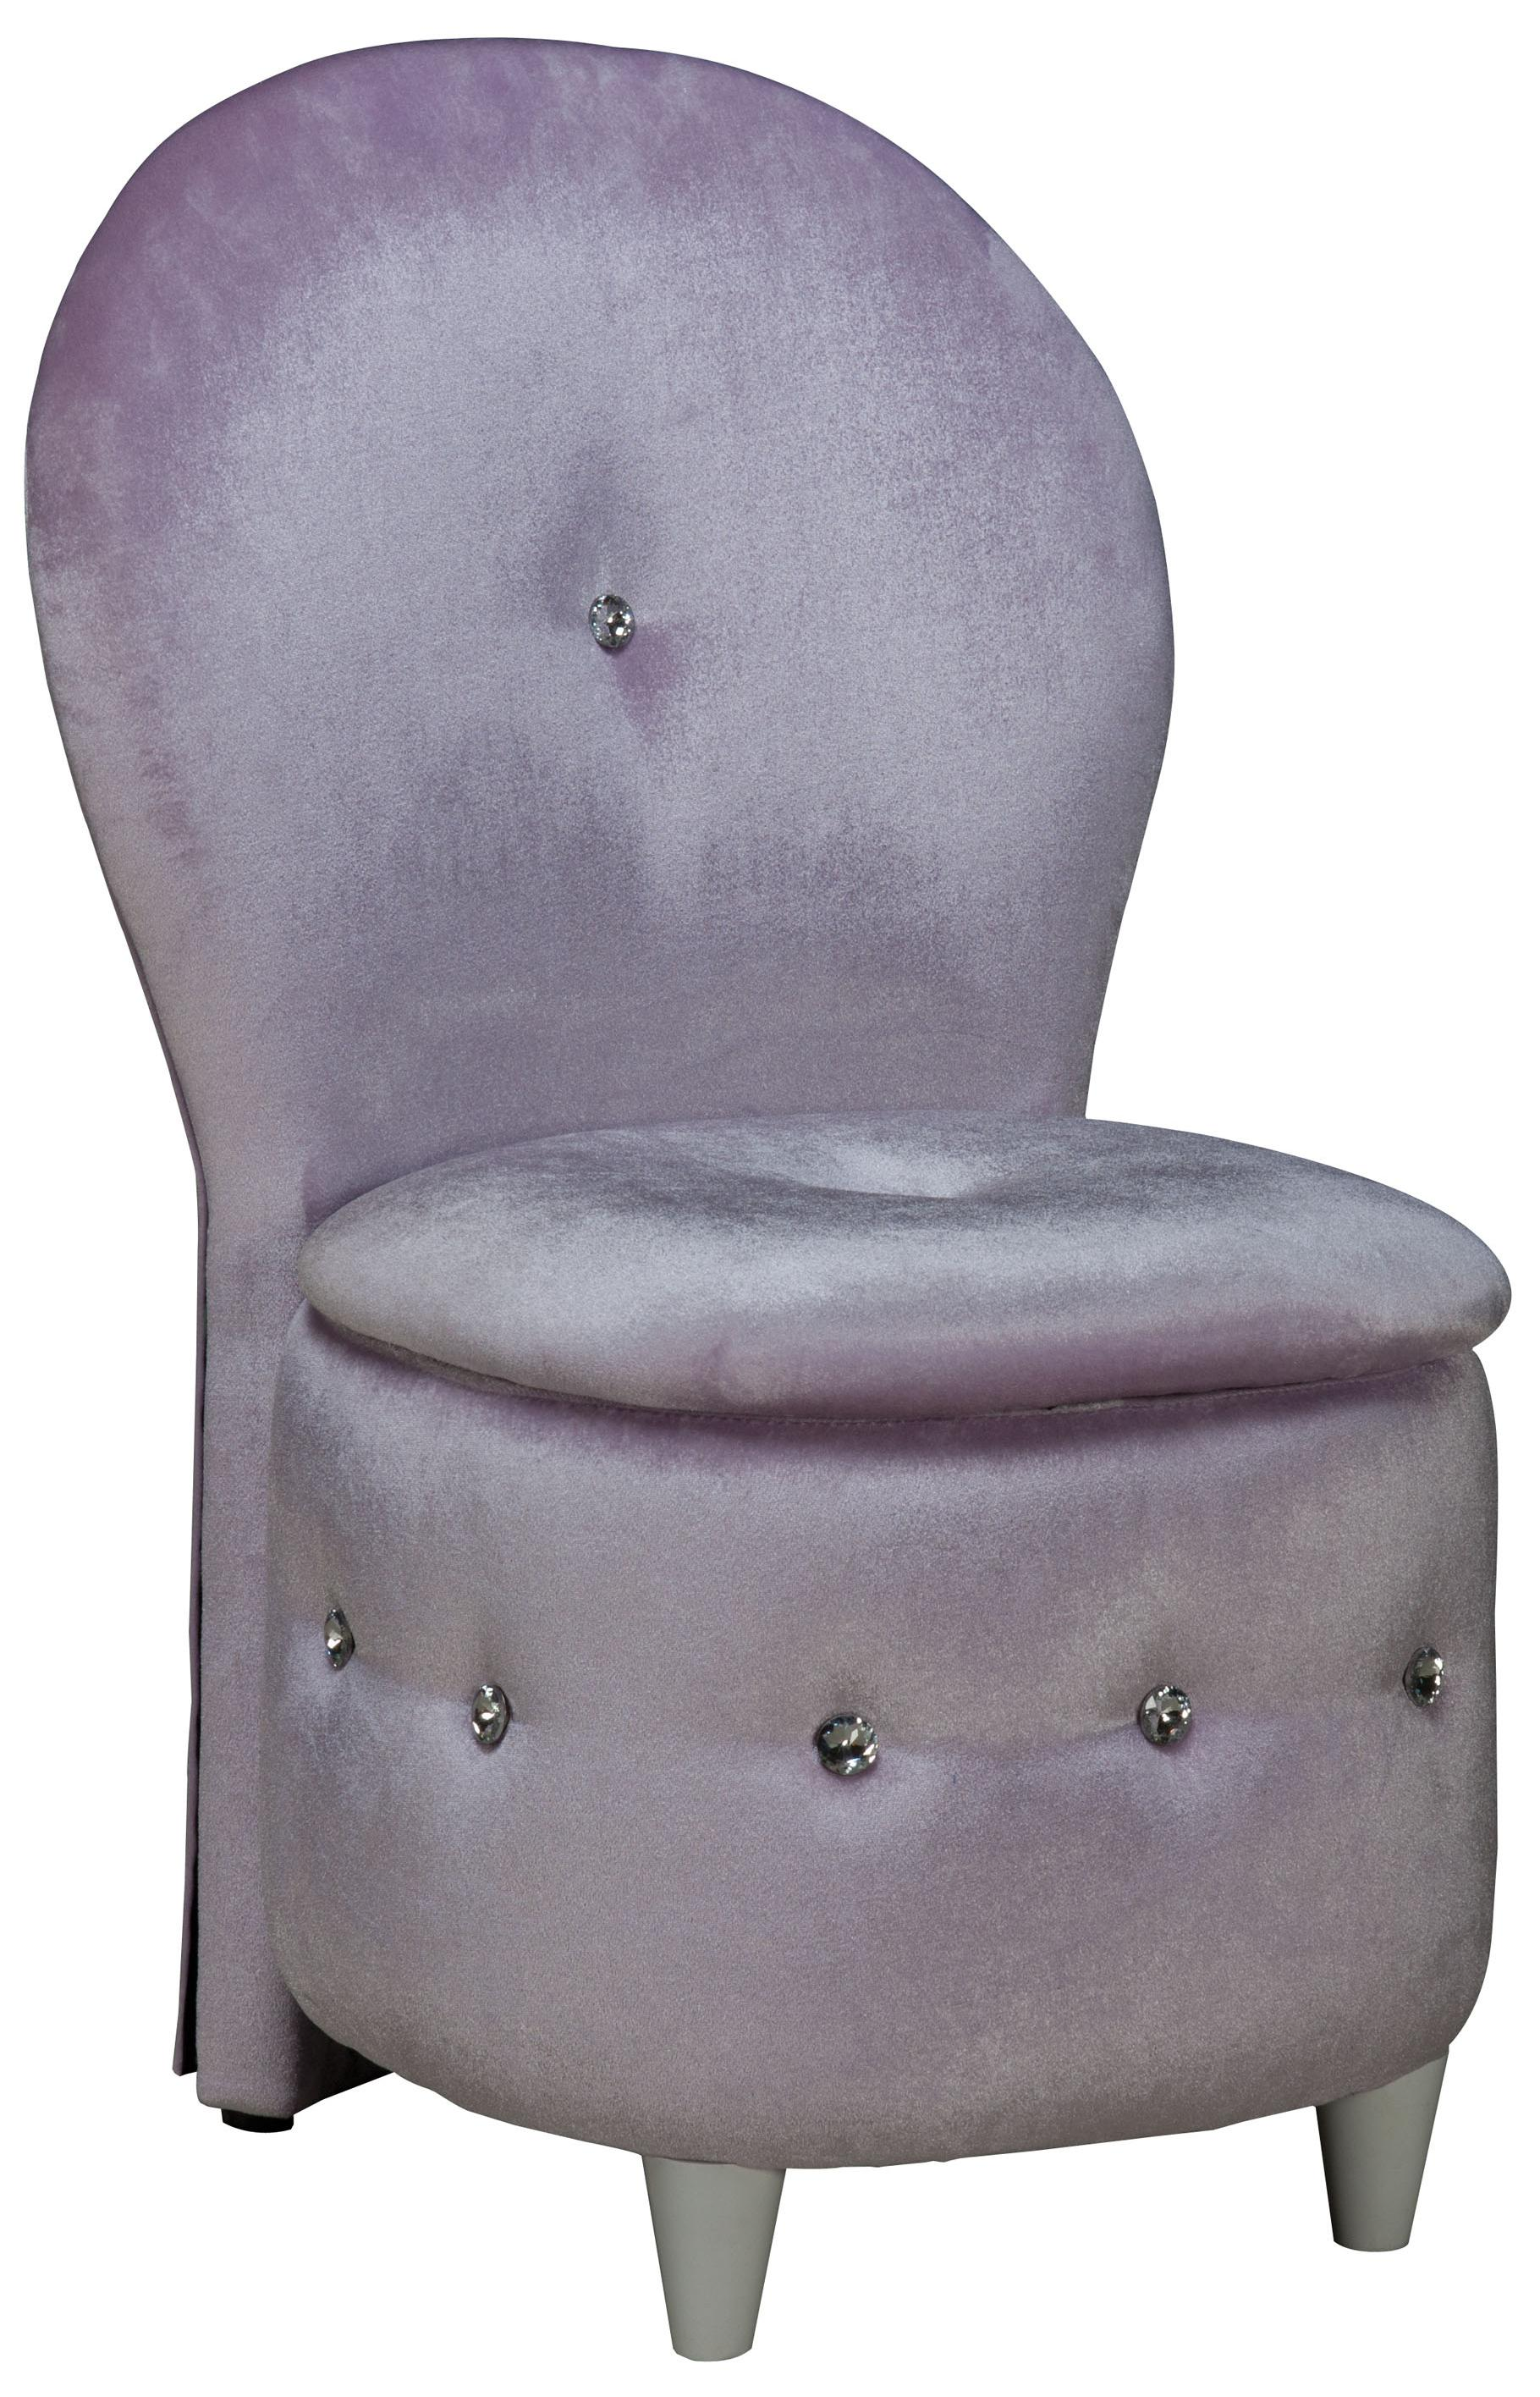 Standard Furniture Sit N Store Lavendar Velvet Chair With Storage Cushion Jacksonville Furniture Mart Upholstered Chair